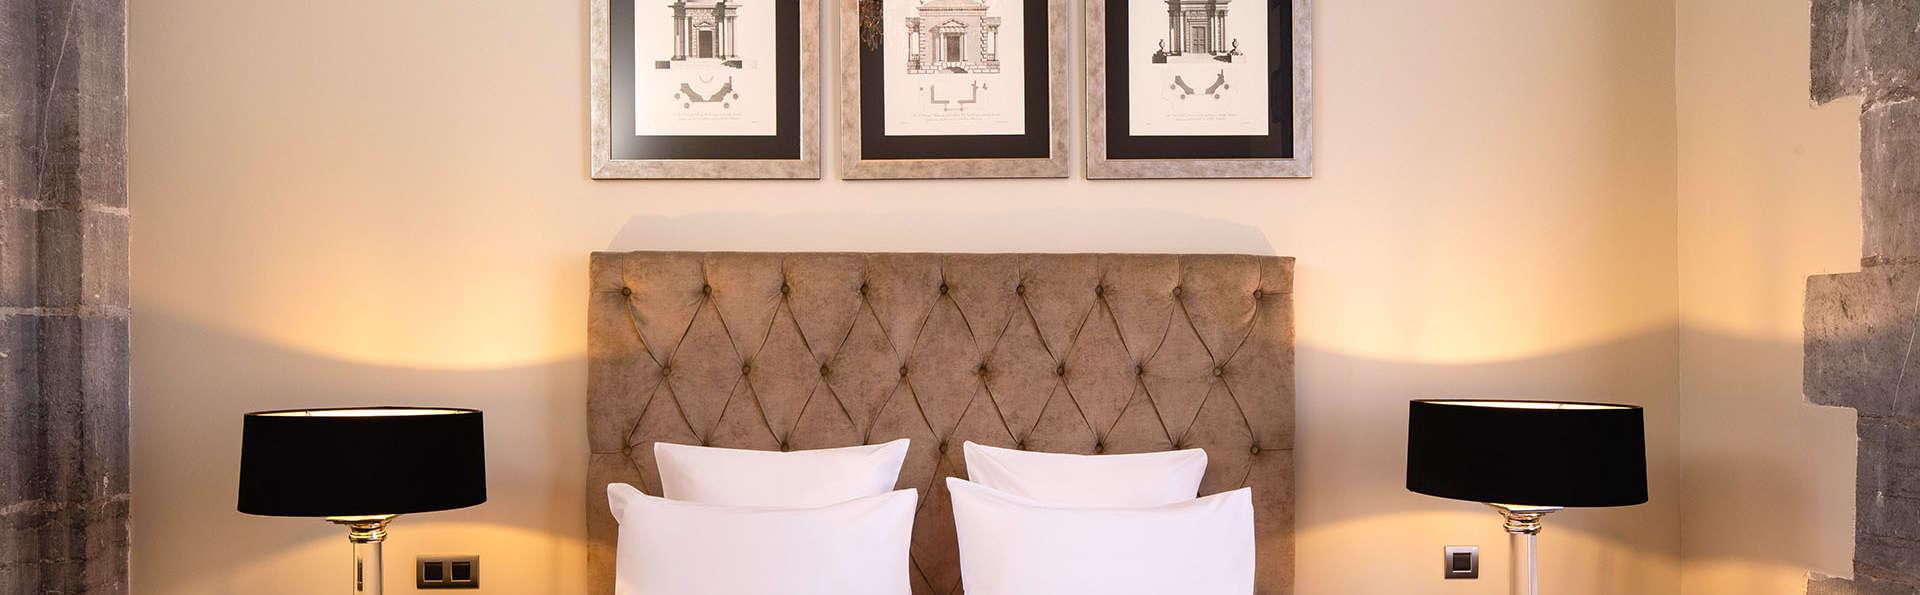 Royal Hainaut Spa & Resort Hotel - EDIT_Chambres_privilege_Royal_Hainaut_MD_02.jpg